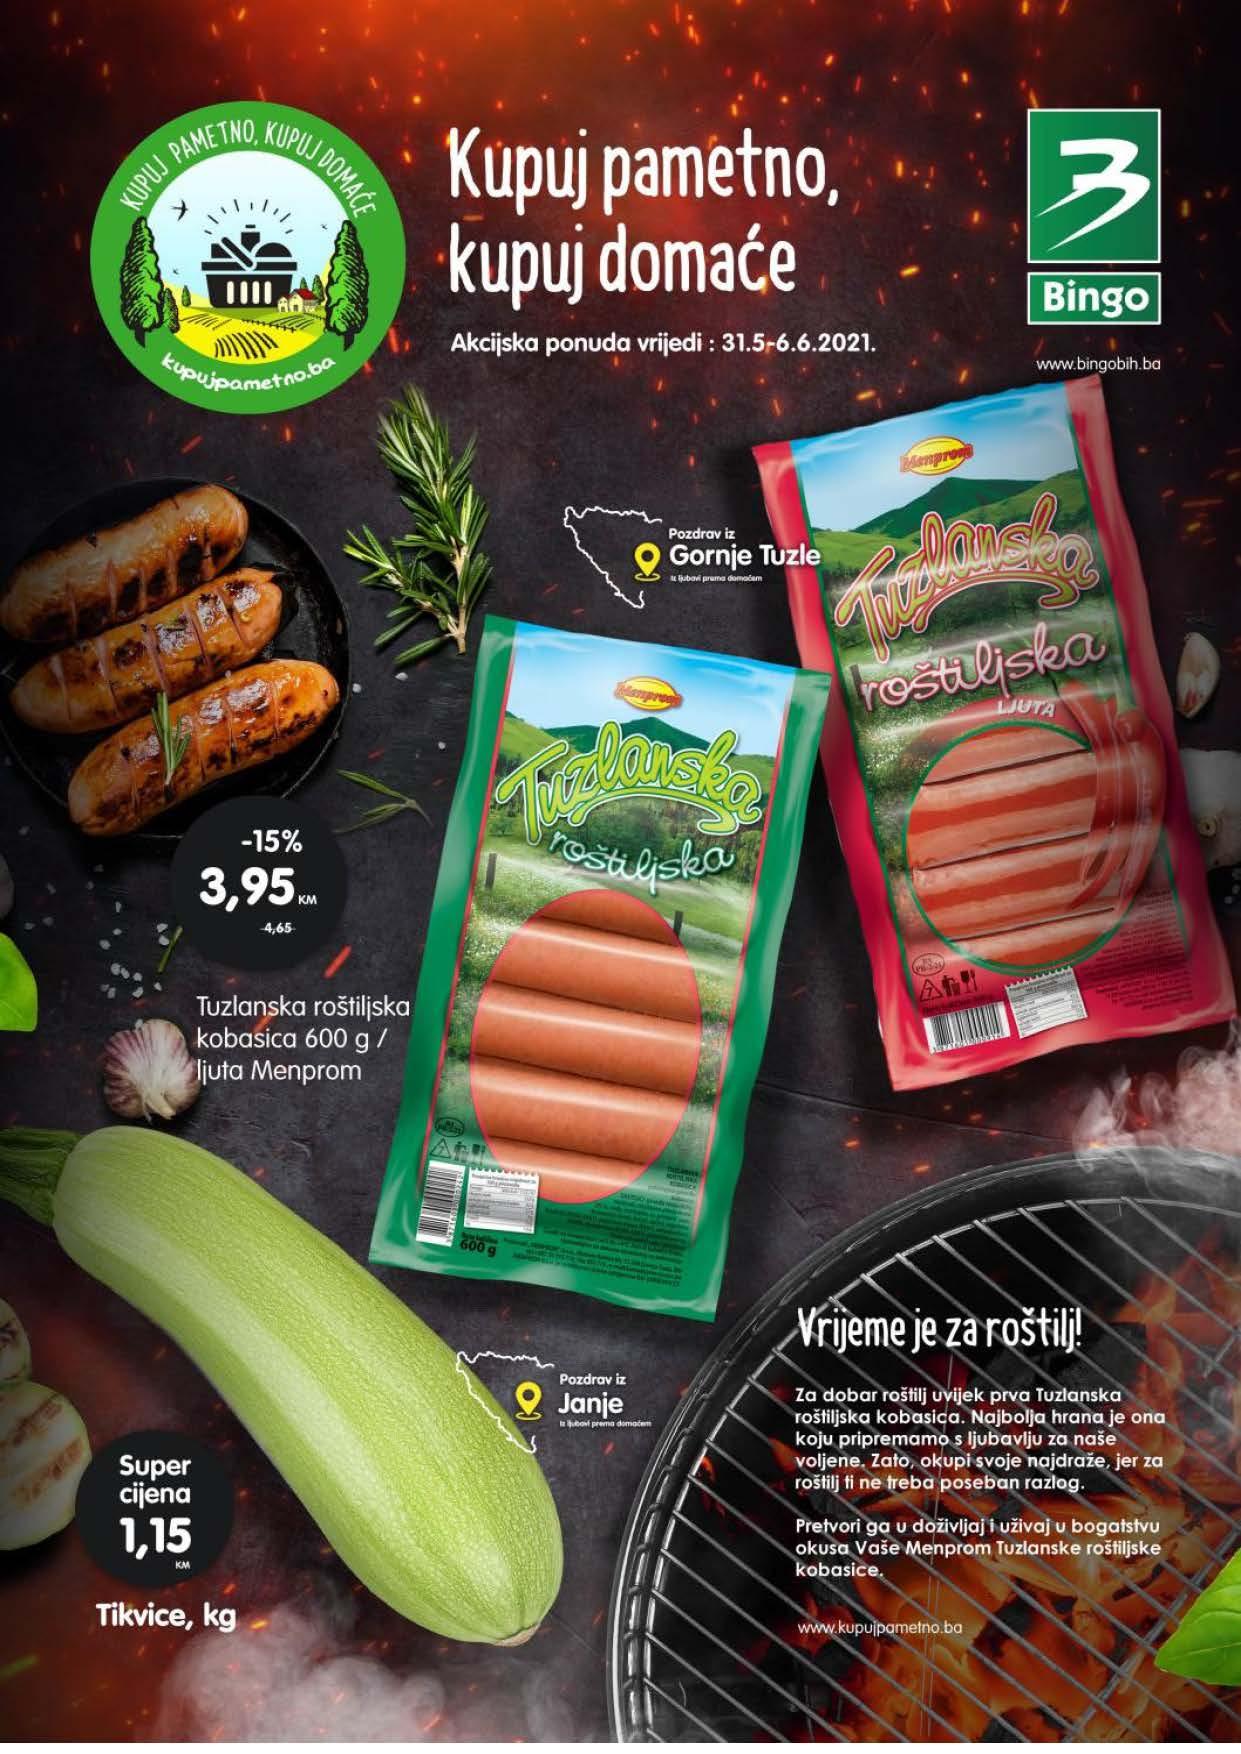 BINGO Katalog AKCIJA Kupuj pametno kupuj domace JUN 2021 31.05.2021. 06.06.2021. eKatalozi.com PR Page 1